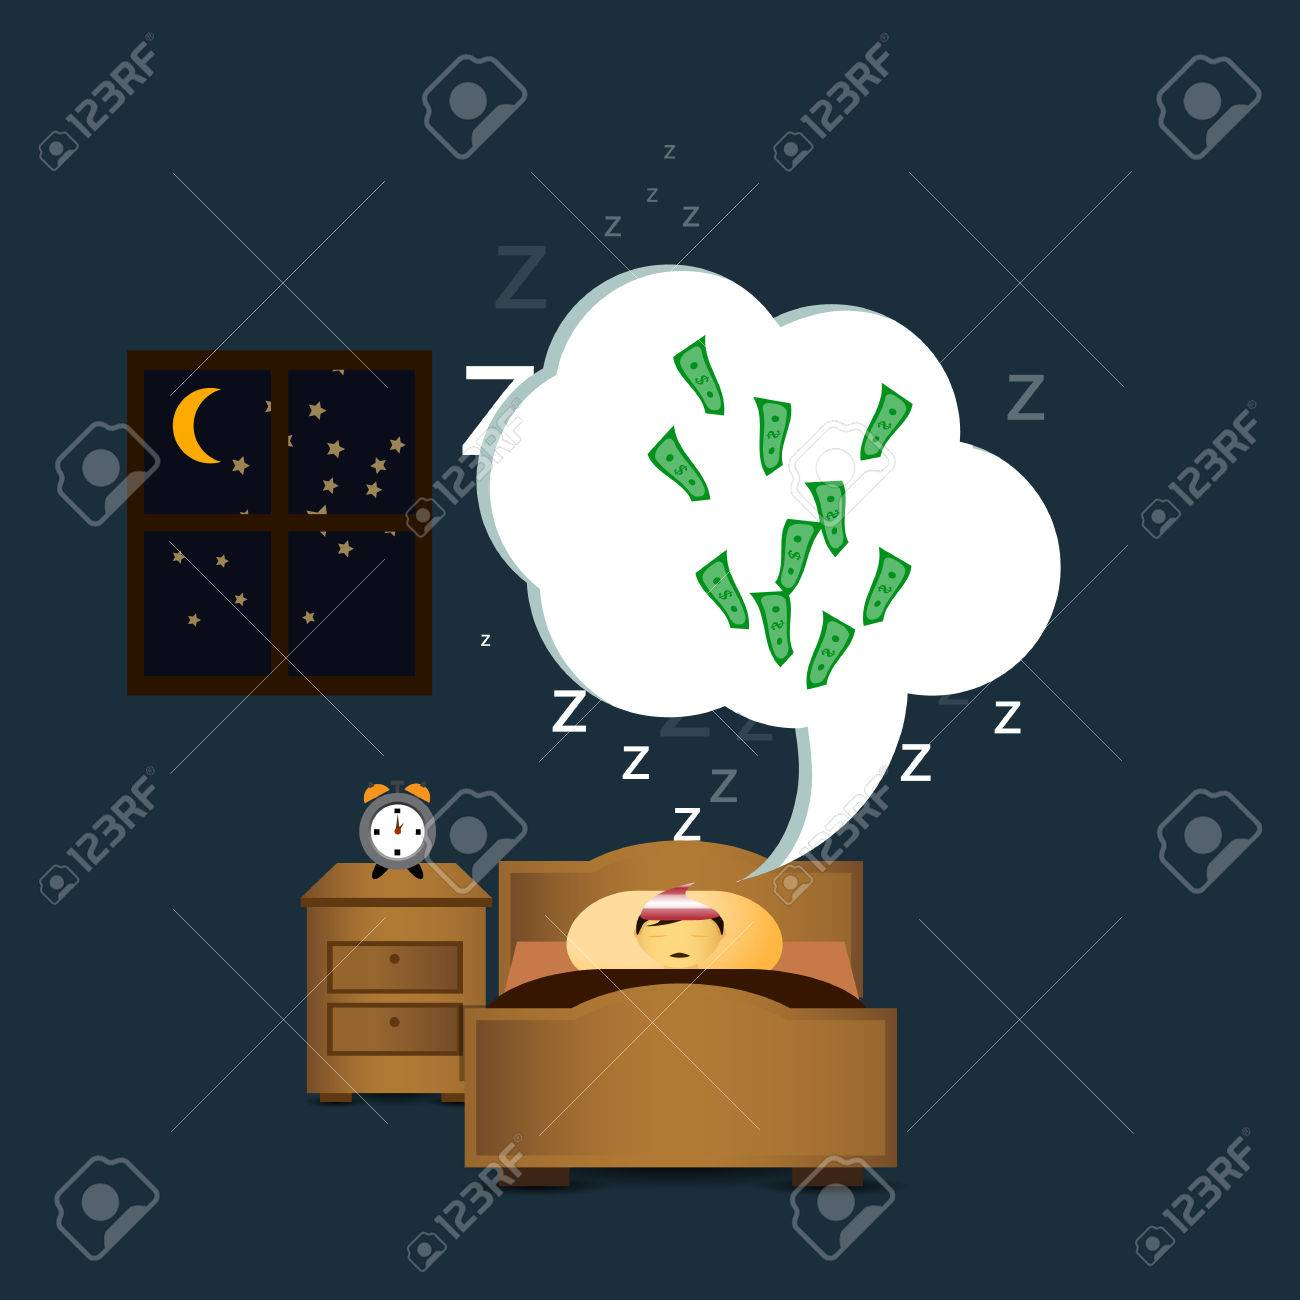 Sleeping Persondreaming Money Stock Vector